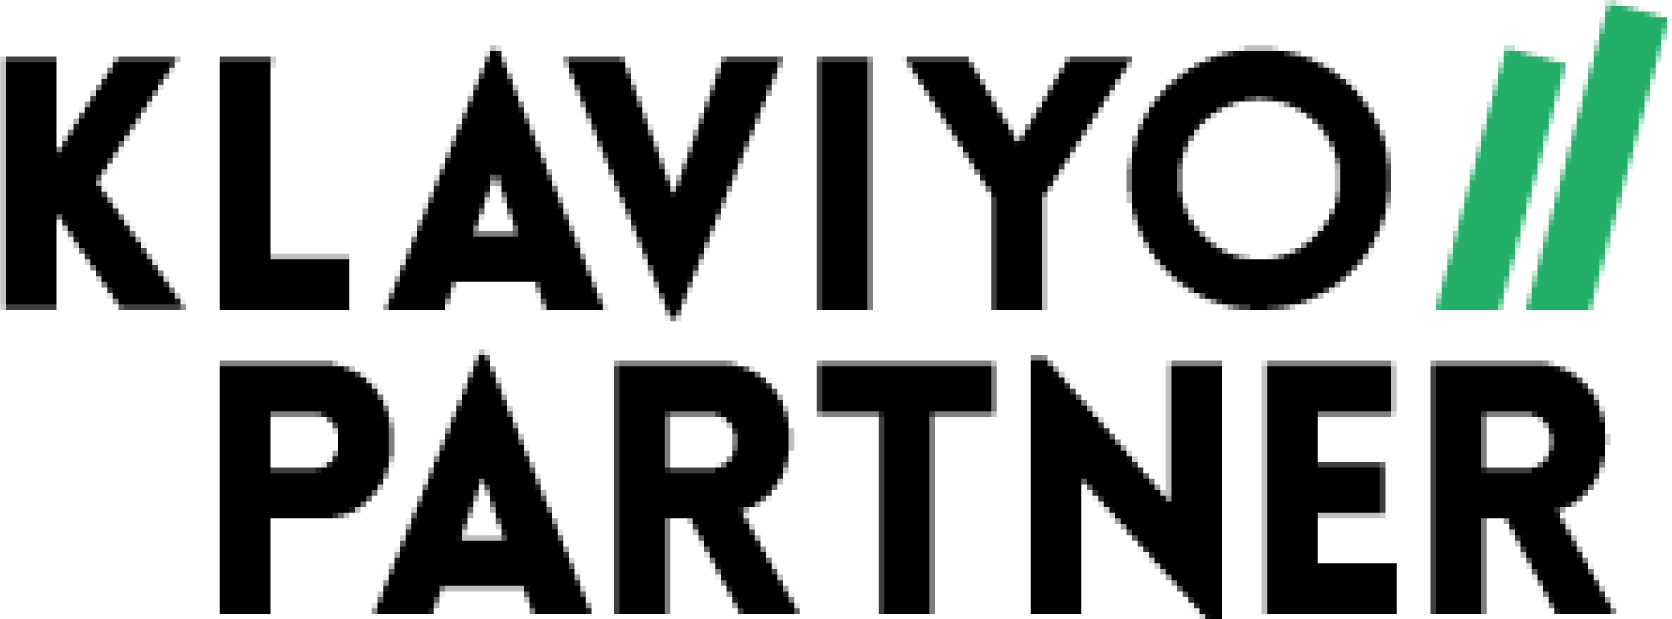 Klaviyo partners